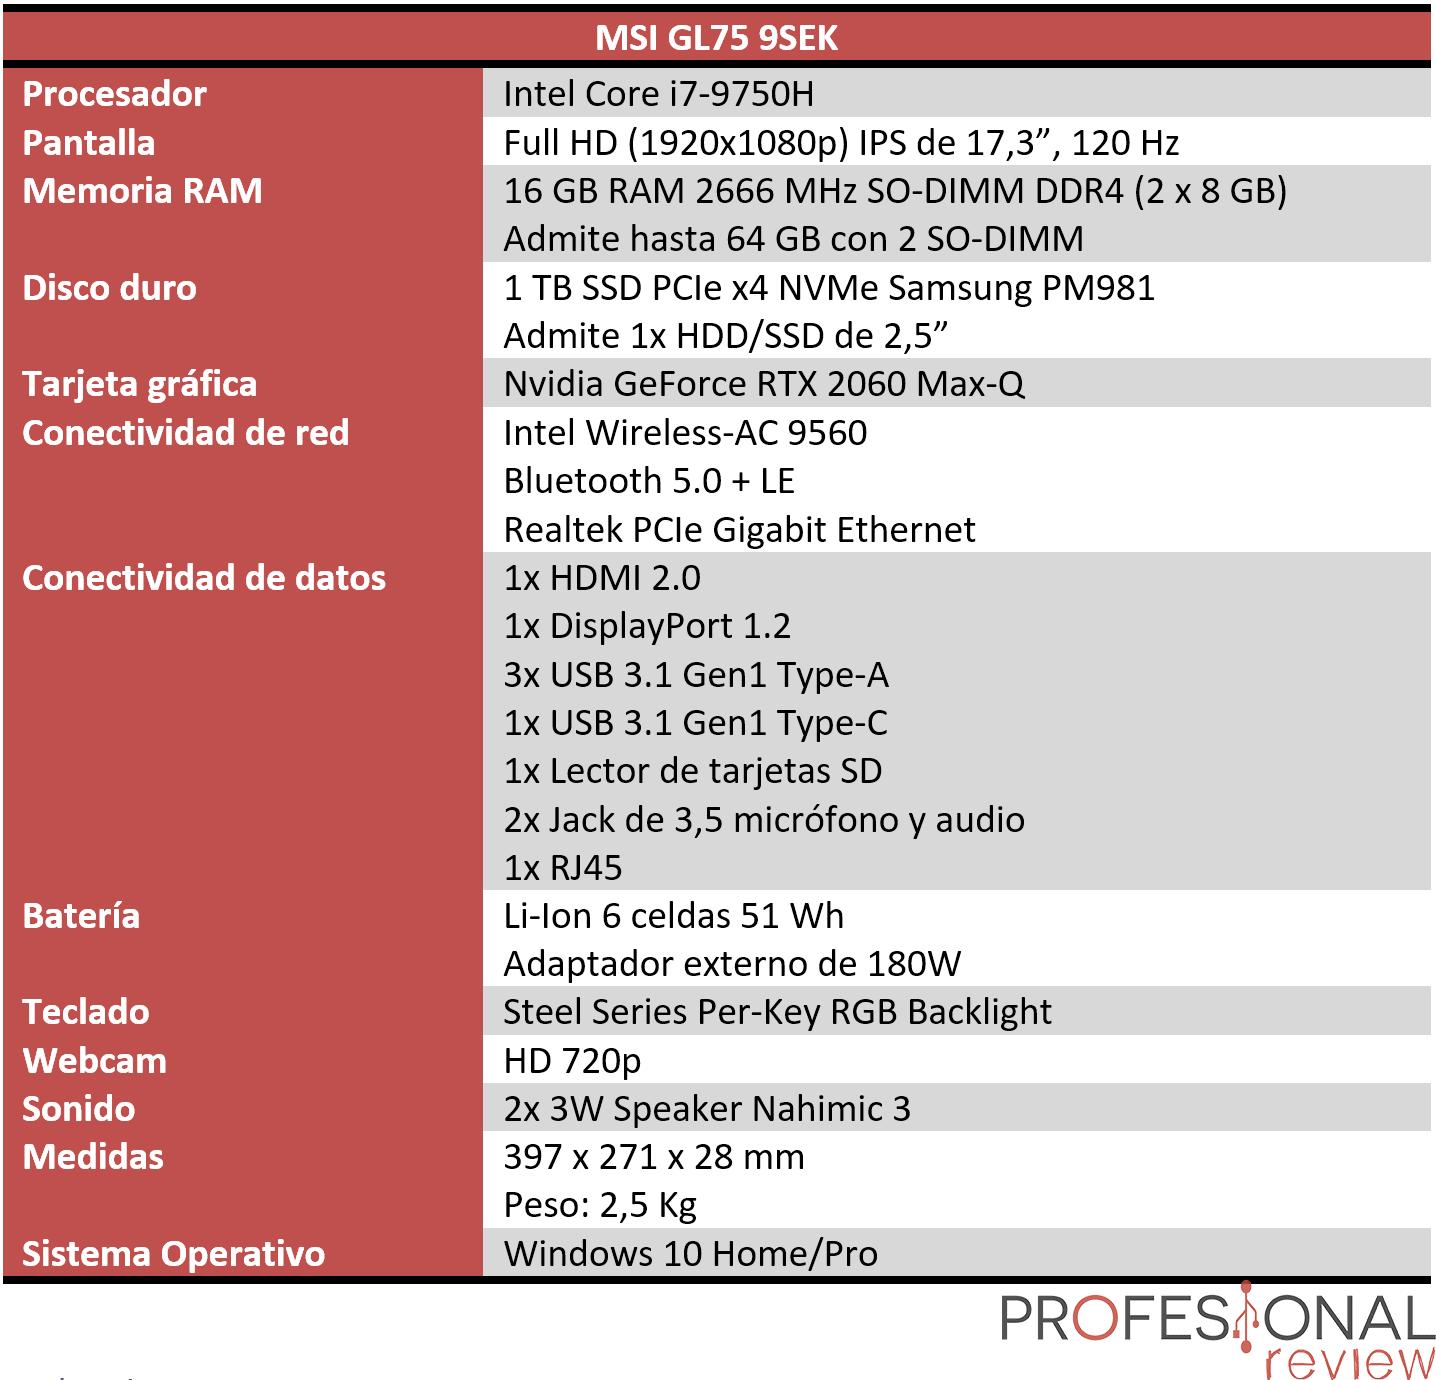 MSI GL75 9SEK Características